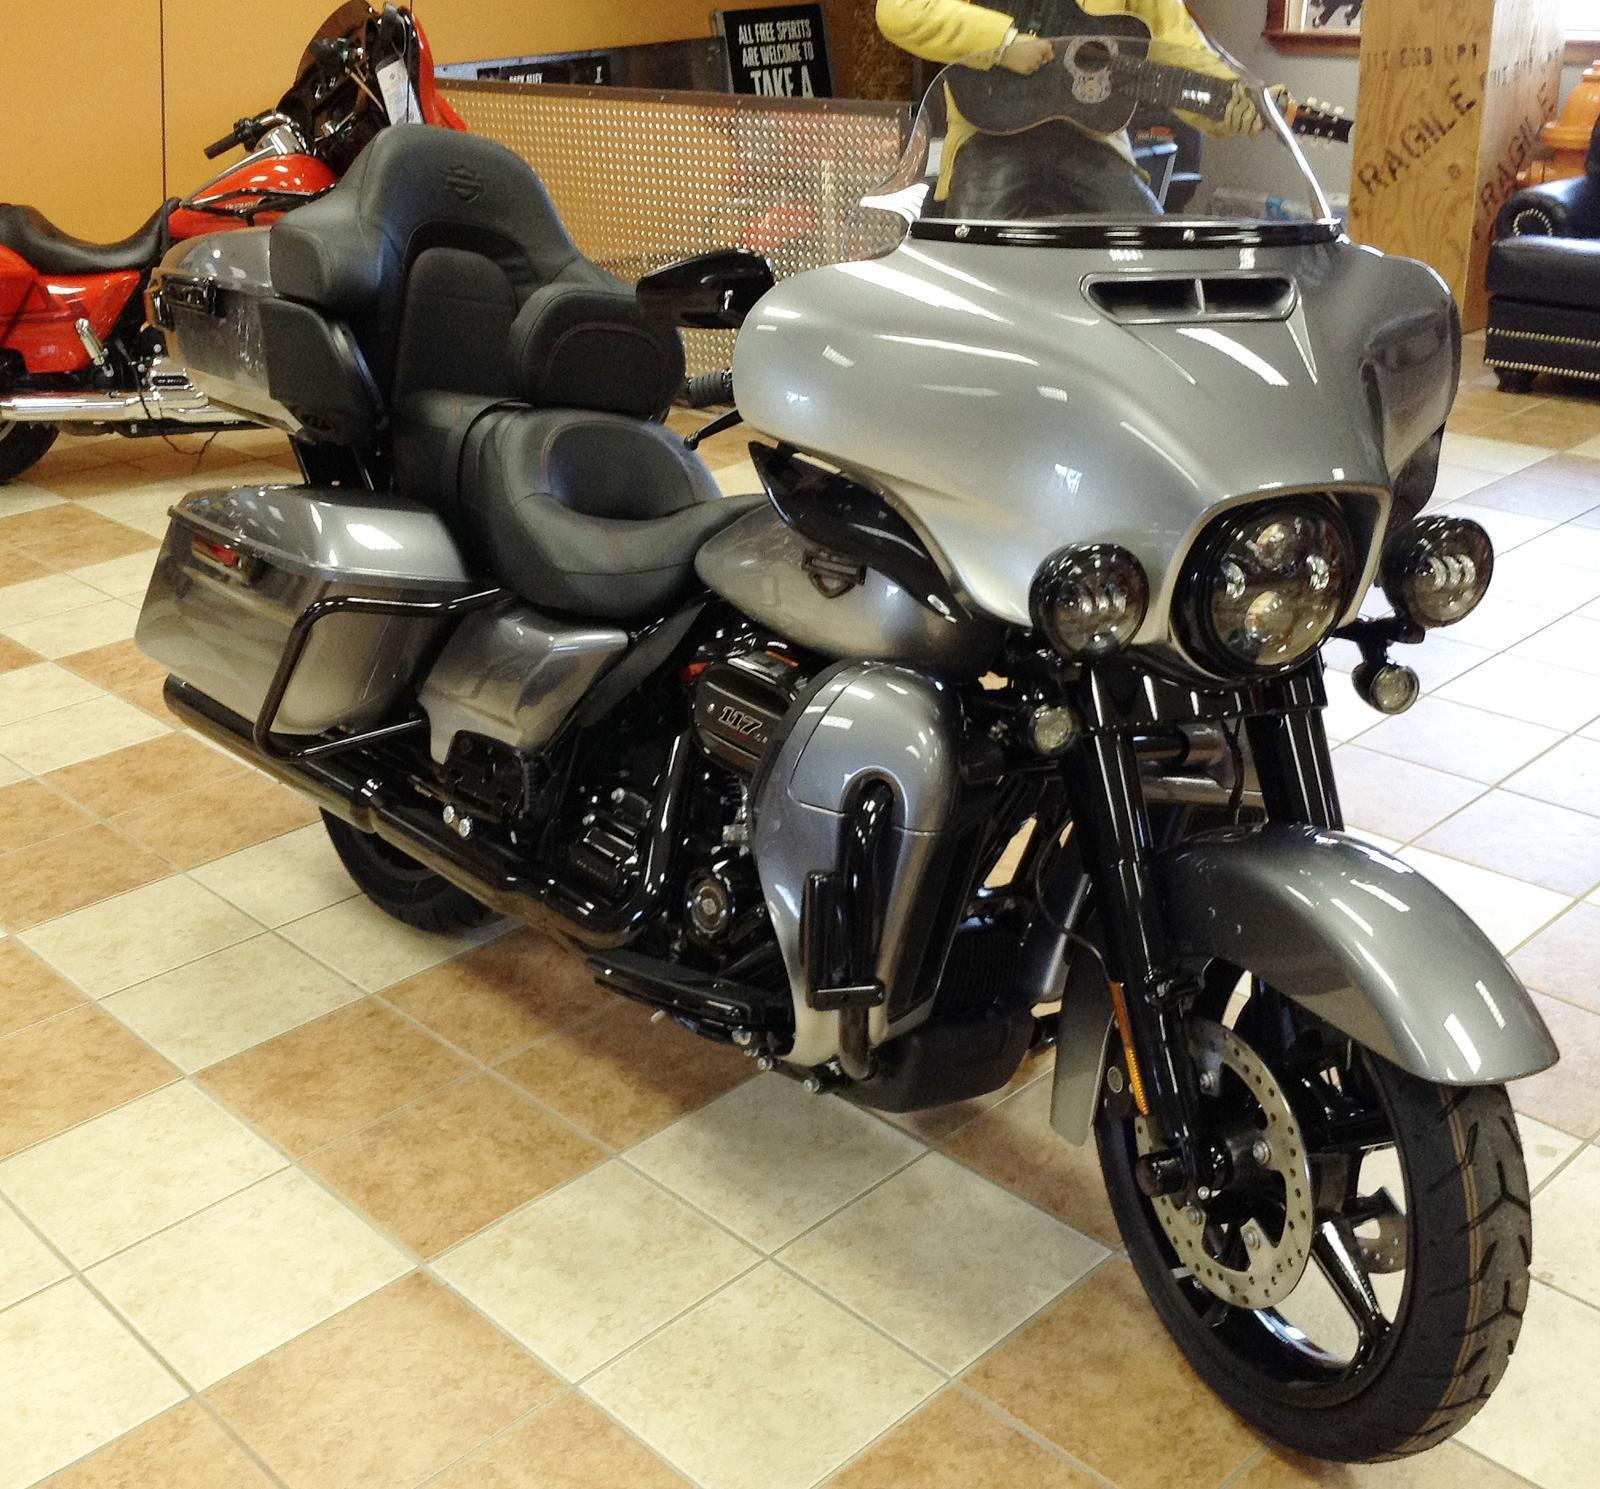 2019 Harley-Davidson® CVO™ Limited for sale in Bonduel, WI | Doc's on